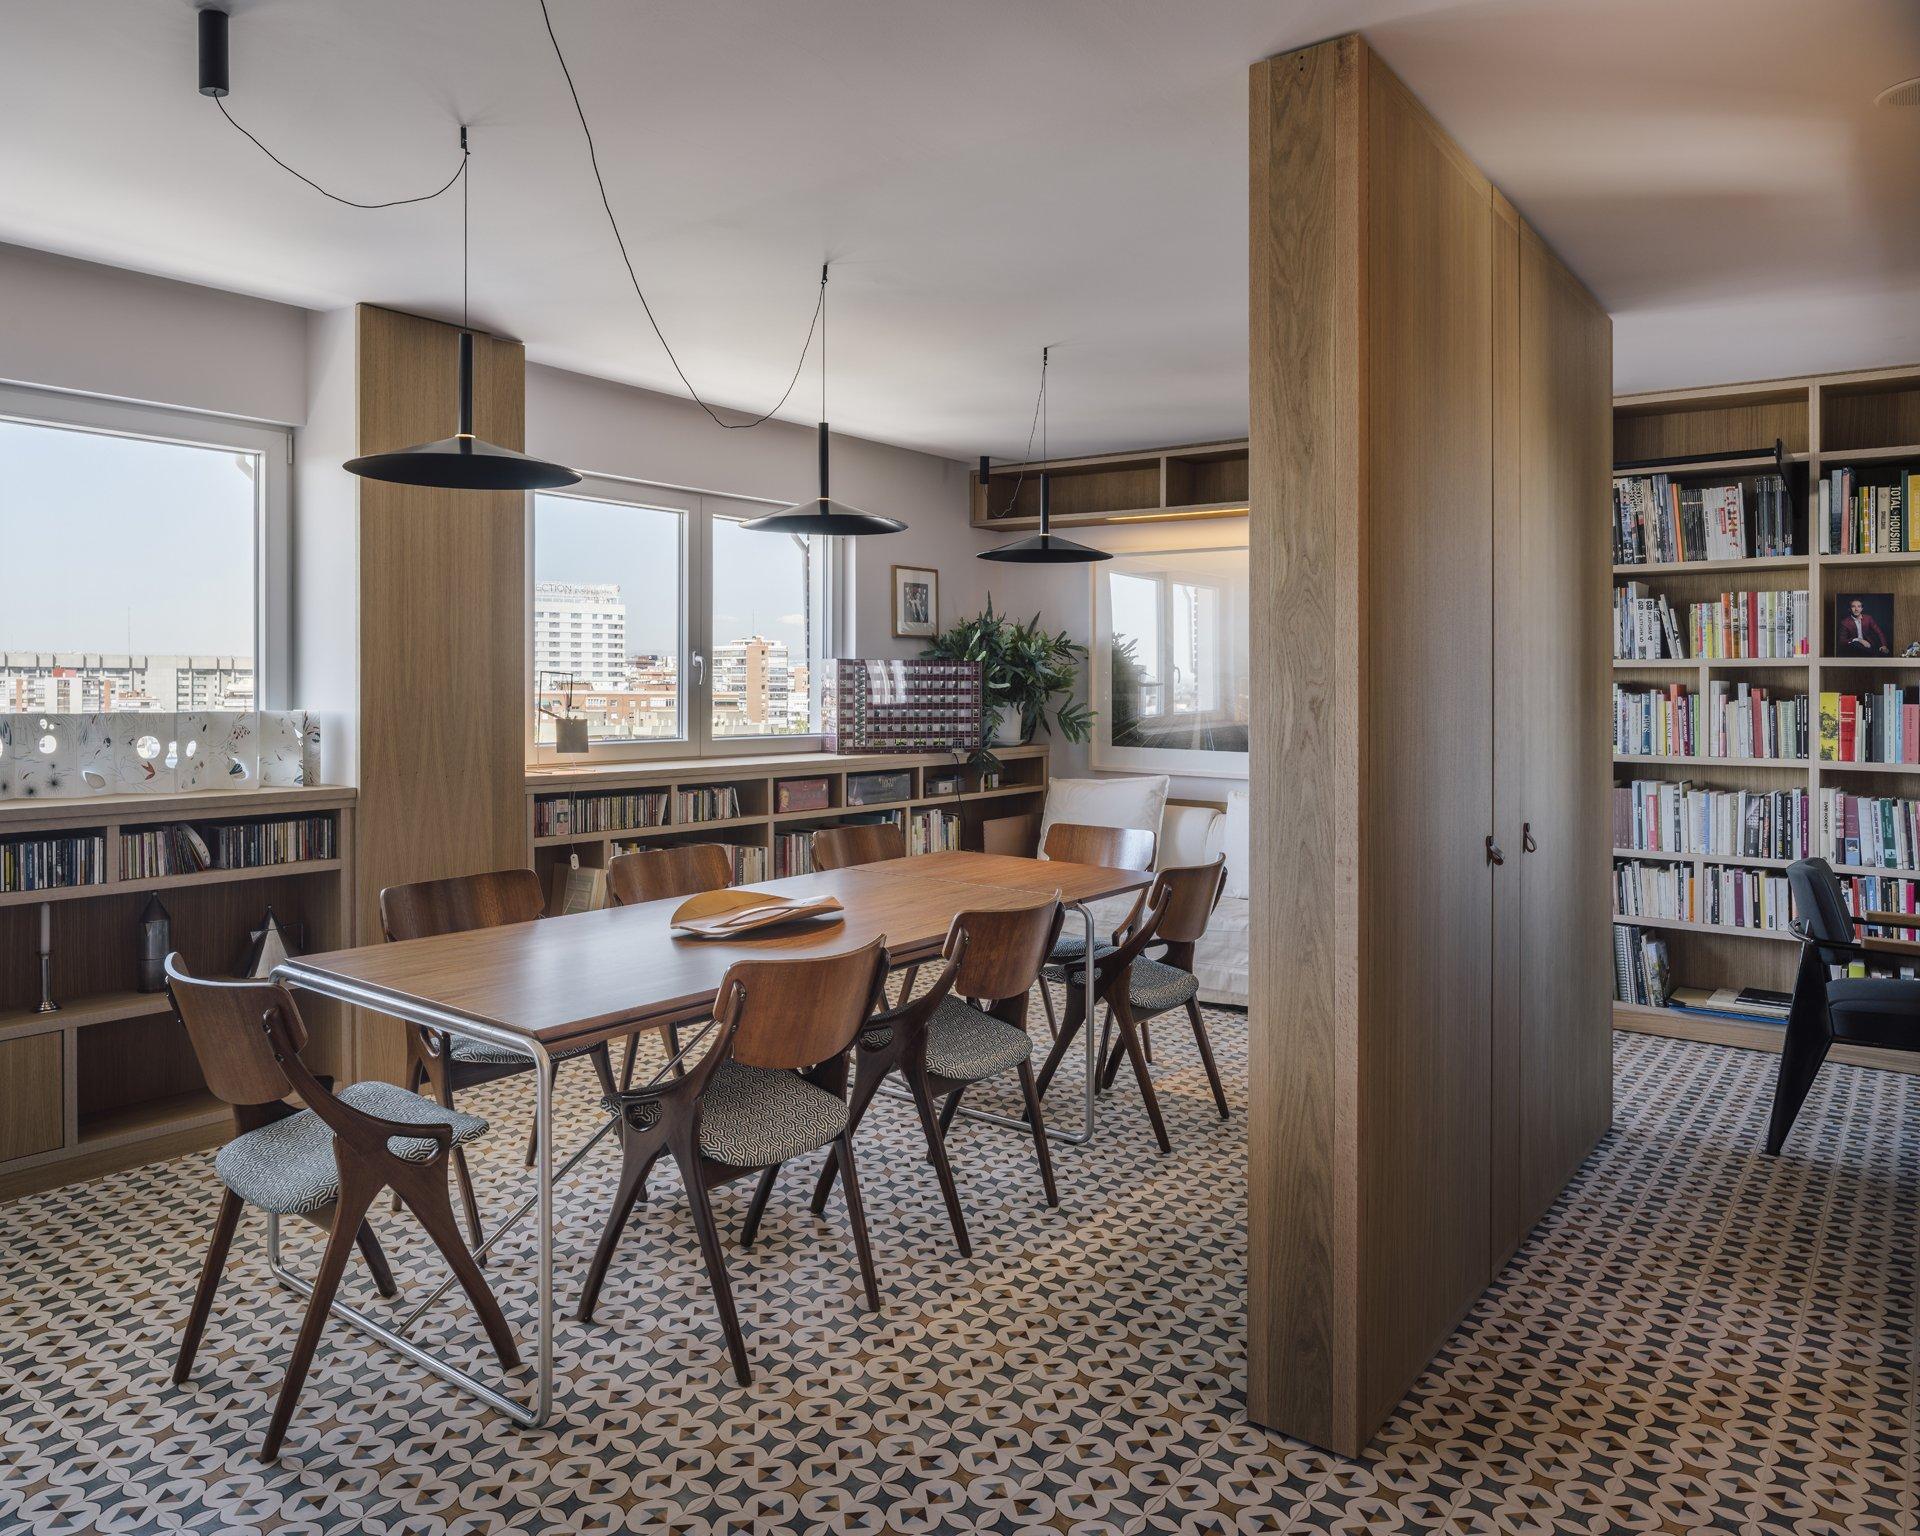 marset-milana-private-residence-galeria-1